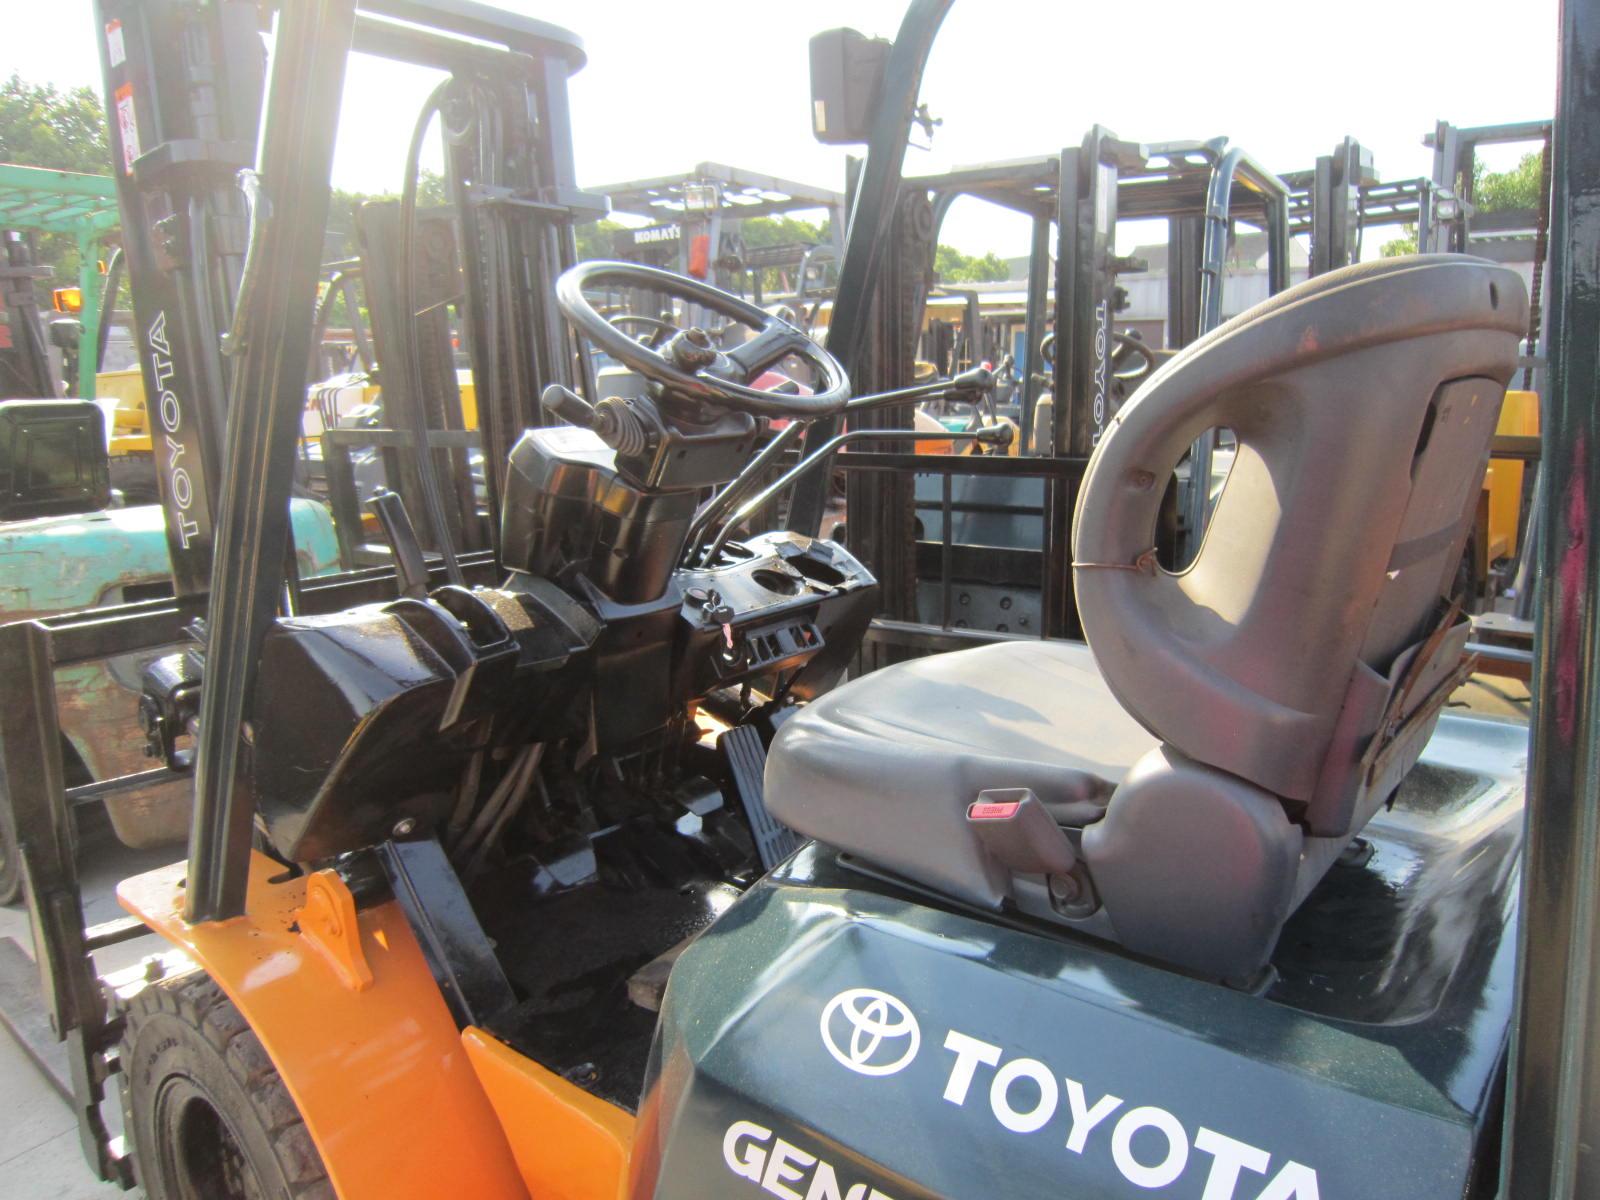 Used Toyota Forklift 3ton Diesel Manual Forklift Truck CPC30 FD30 Mechanical Transmission